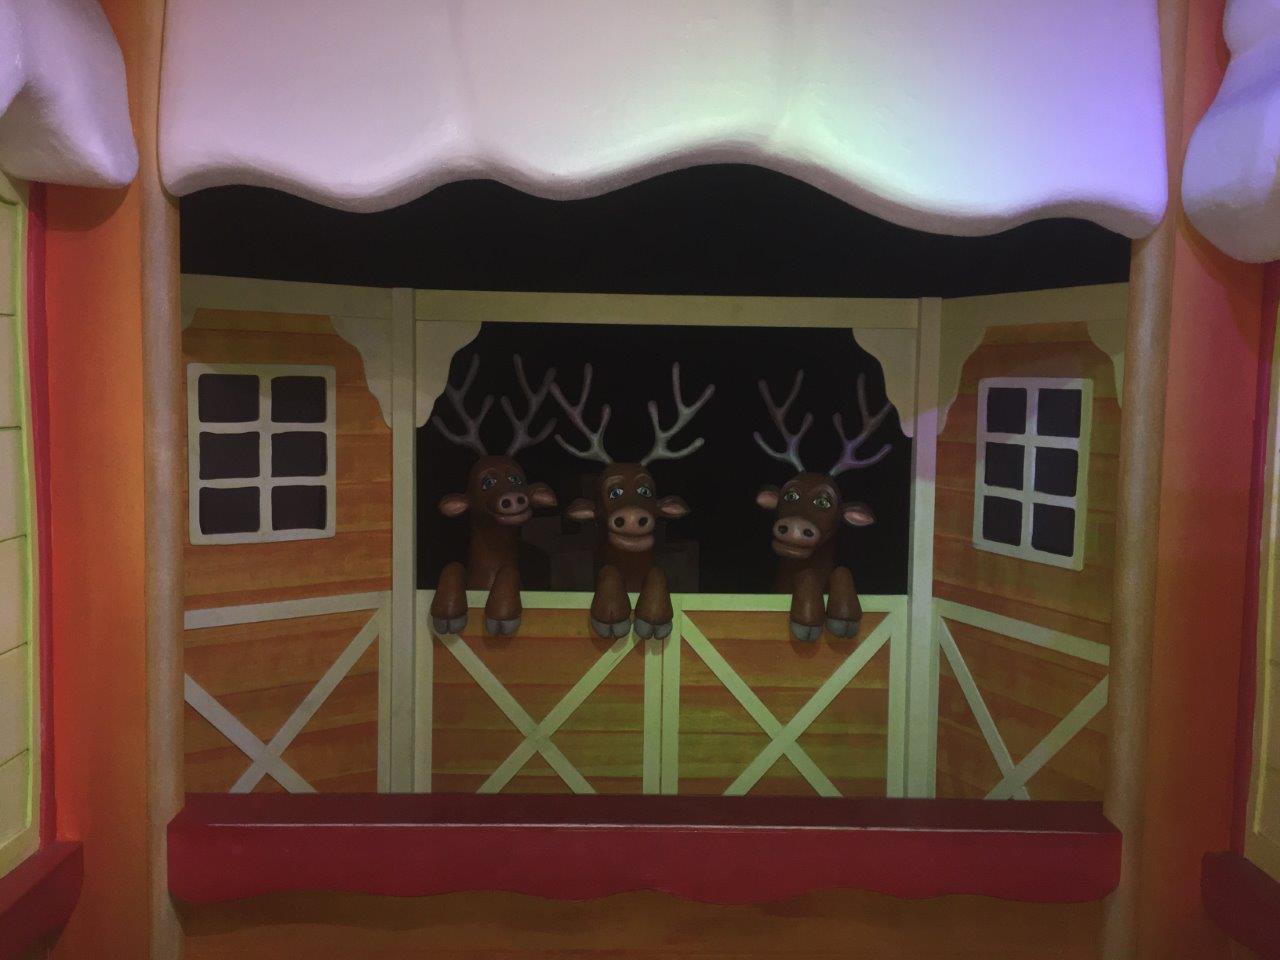 Santa's reindeer in the Magic Cave